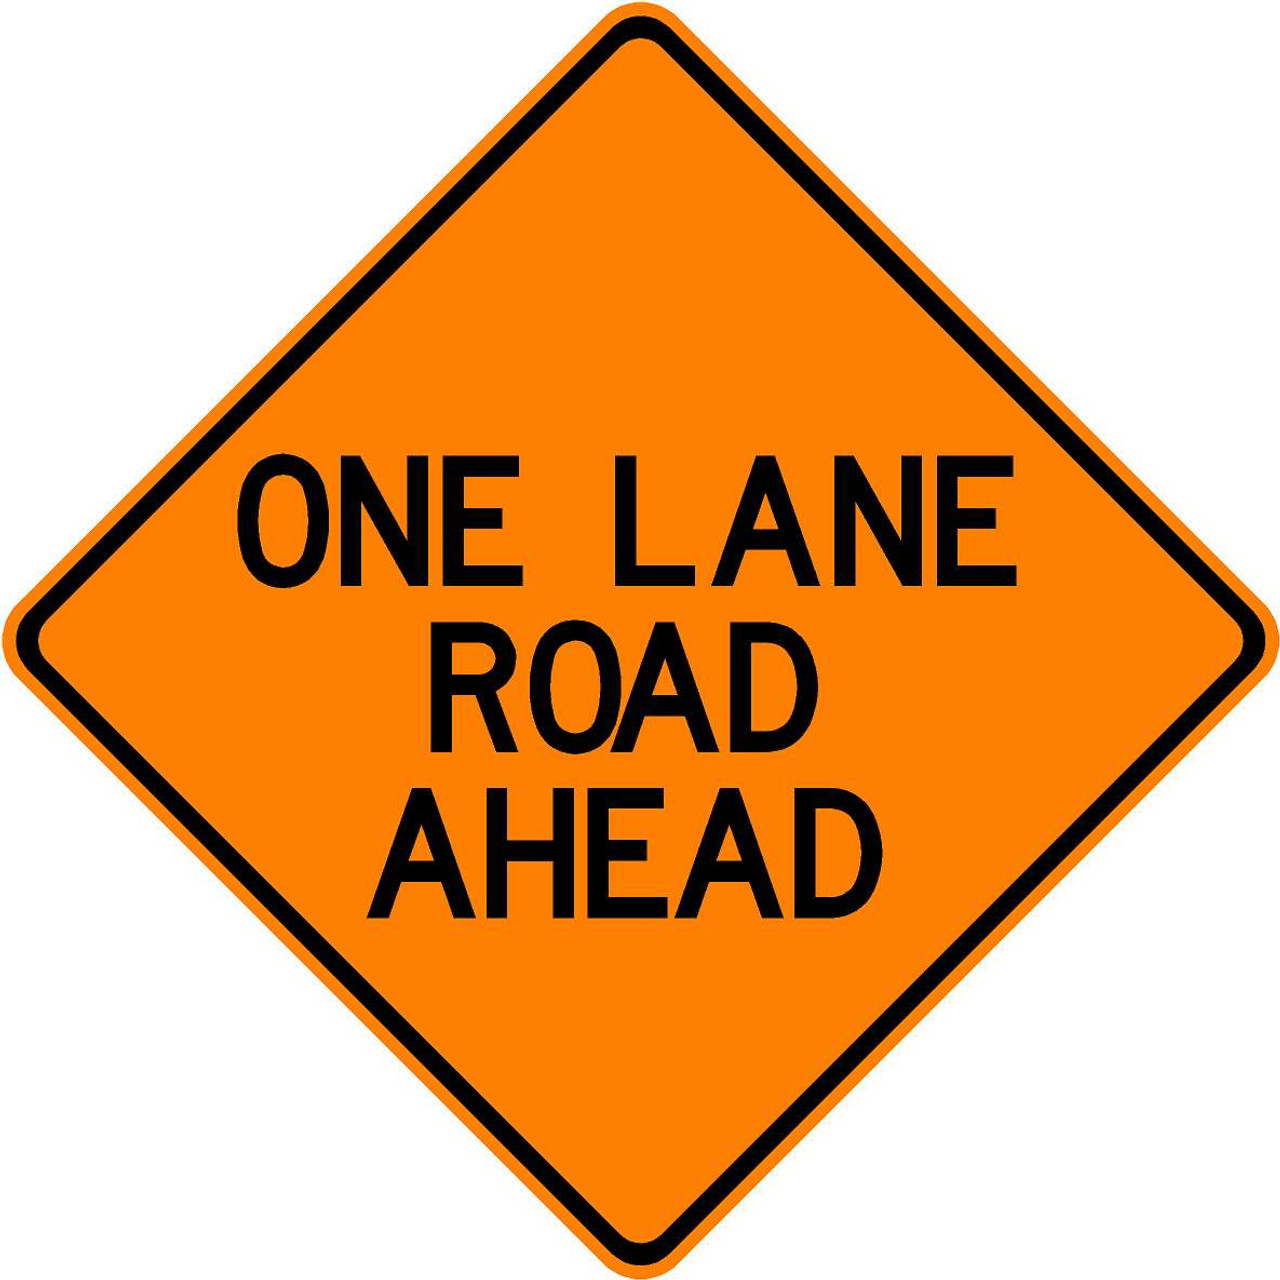 "(C16) ONE LANE ROAD AHEAD - 48"" VINYL"